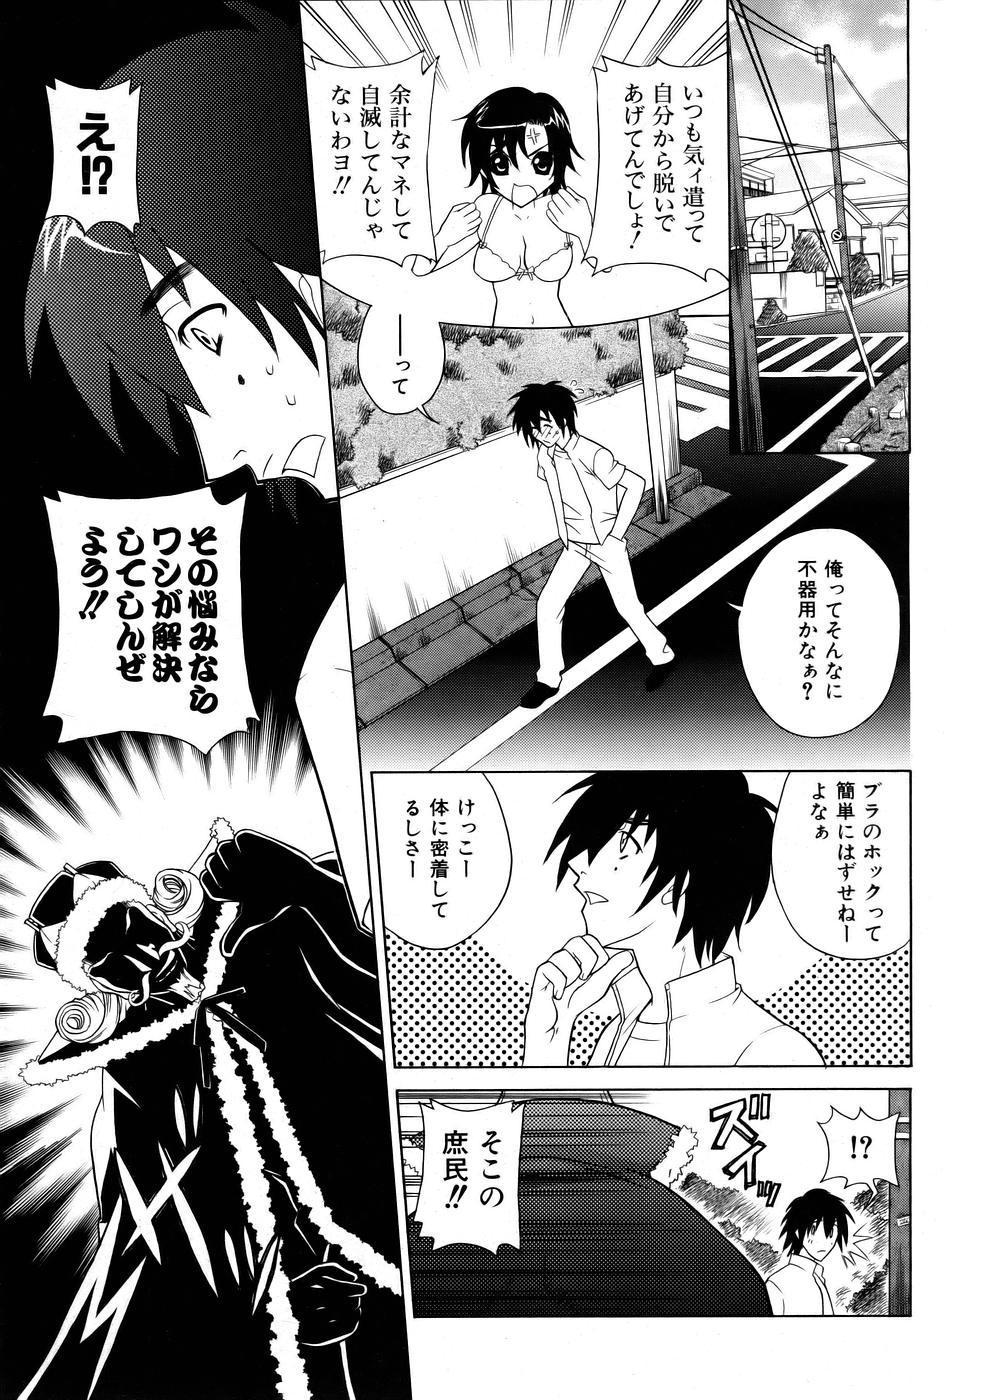 COMIC AUN 2005-10 Vol. 113 304